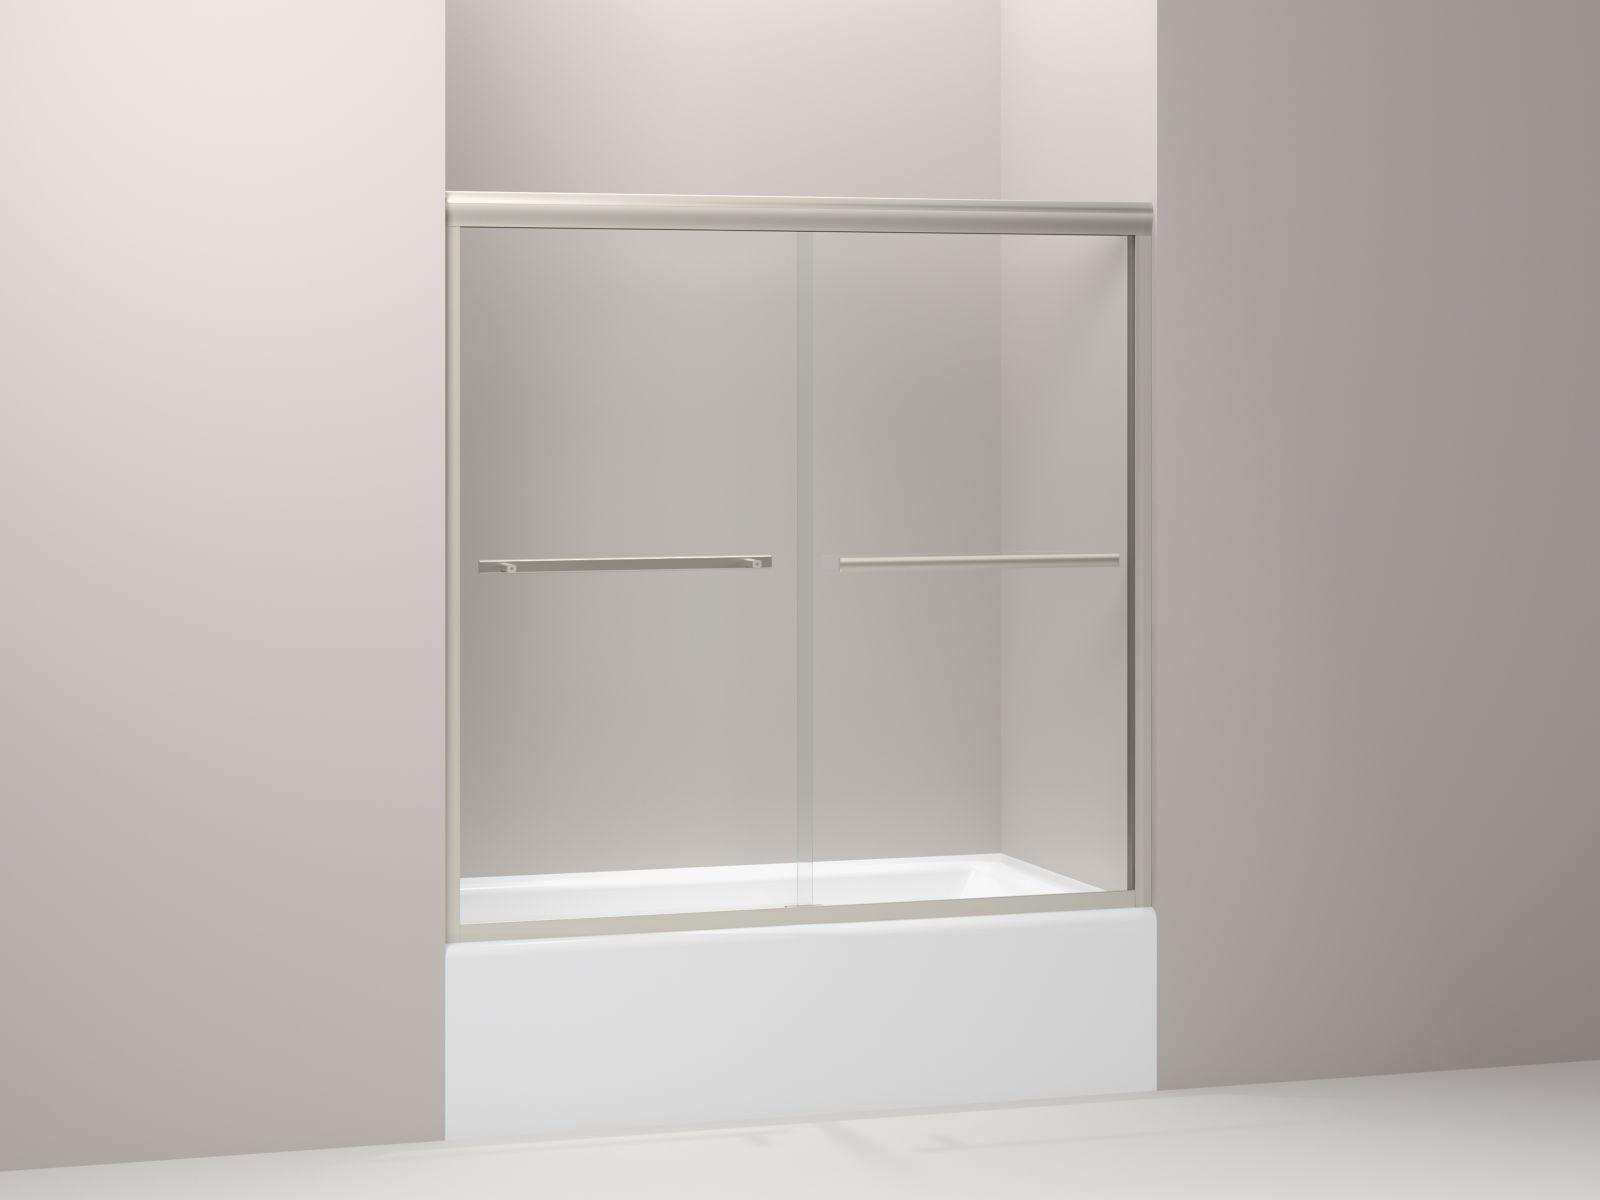 "Kohler Gradient™ K-709062-L-MX sliding bath door, 58-1/16"" H x 59-5/8"" W, with 1/4"" thick Crystal Clear glass Matte Nickel"